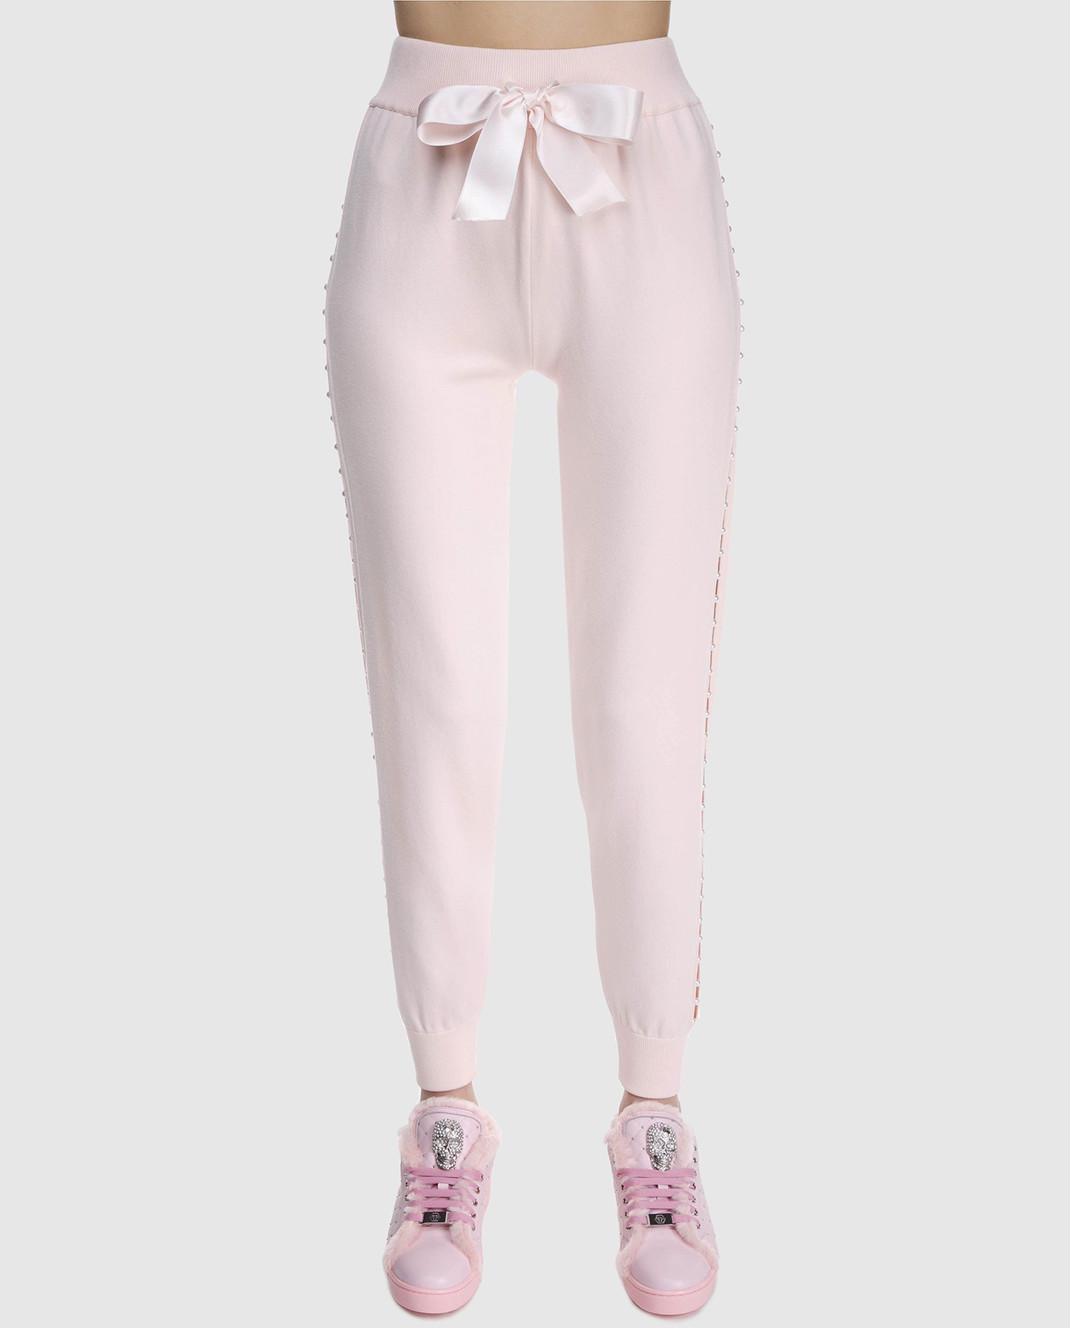 Philipp Plein Пудровые брюки WKT0034 изображение 3